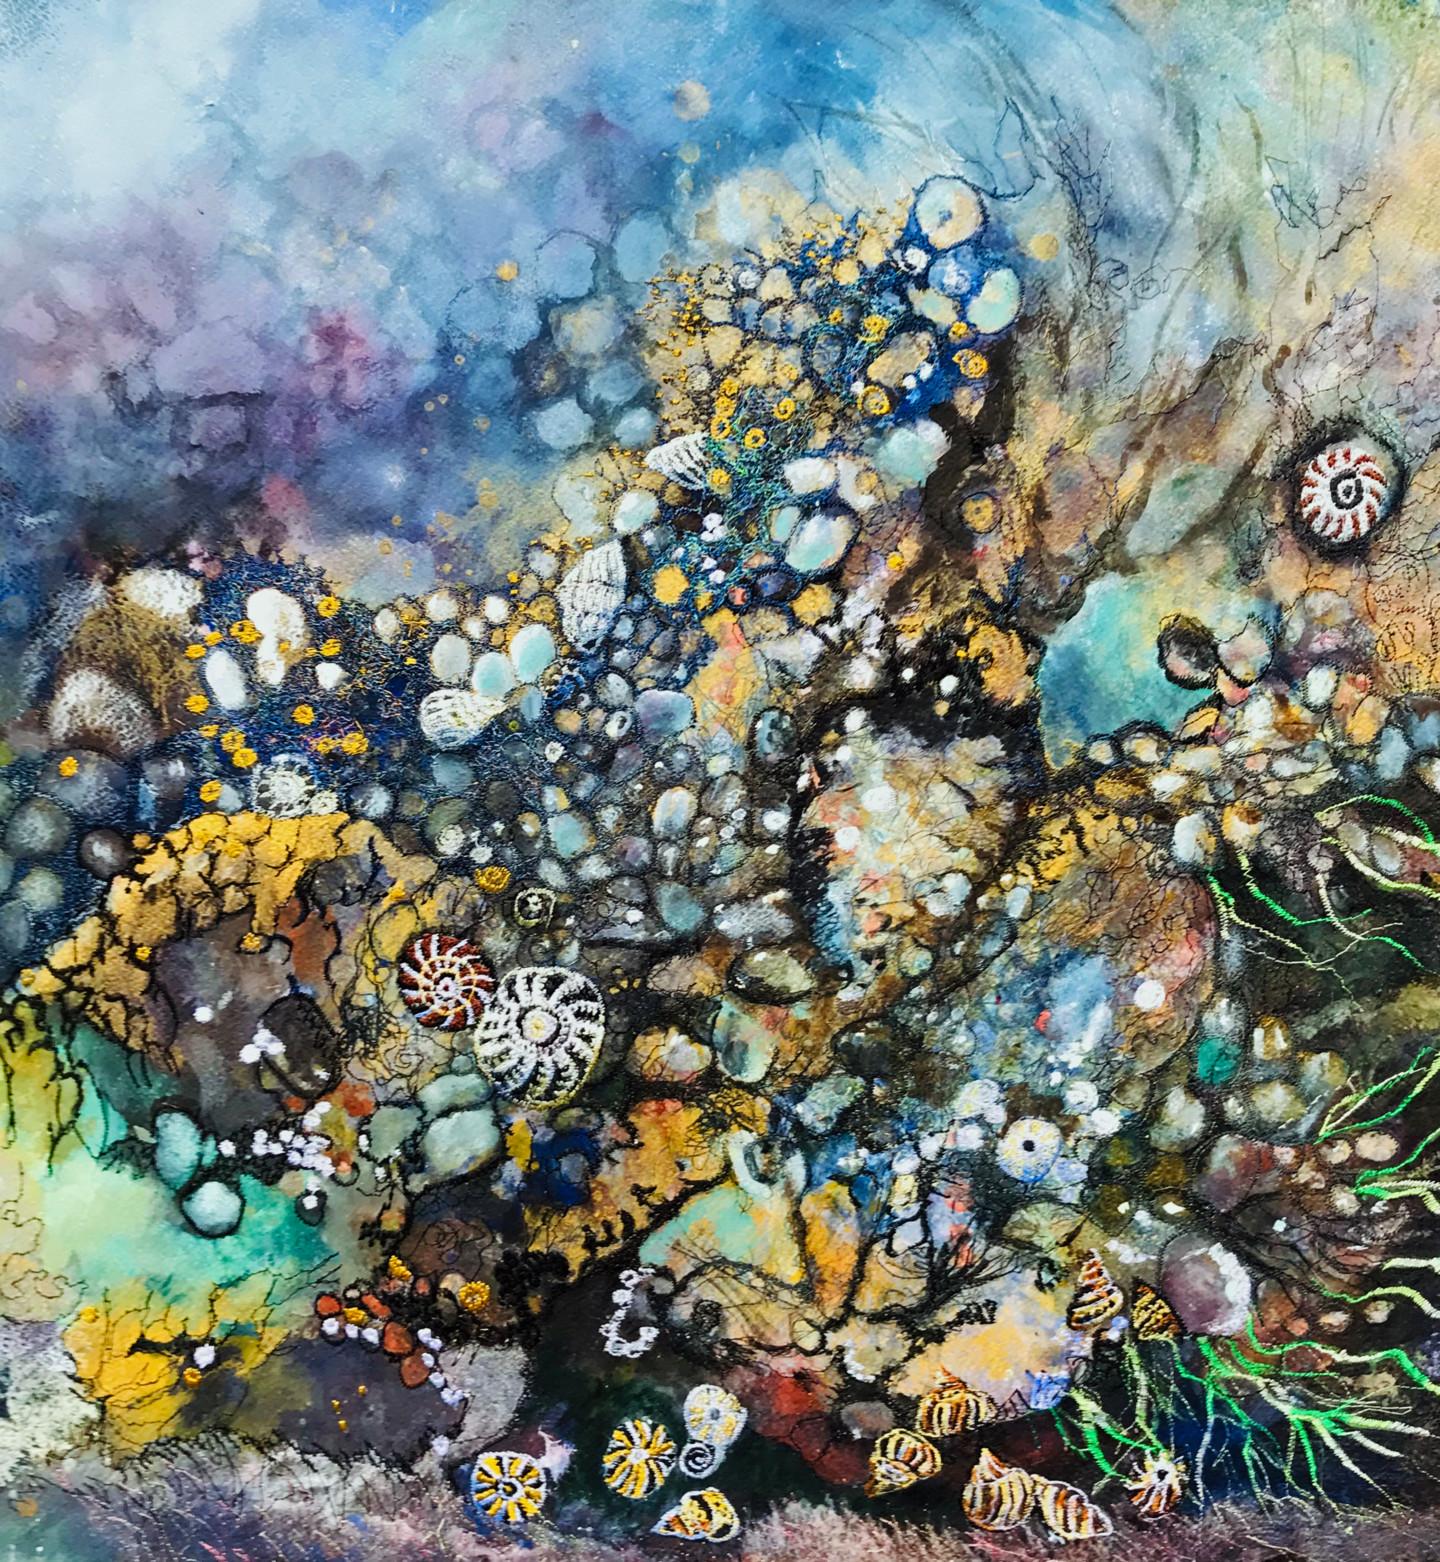 Ann Dunbar - Submergence